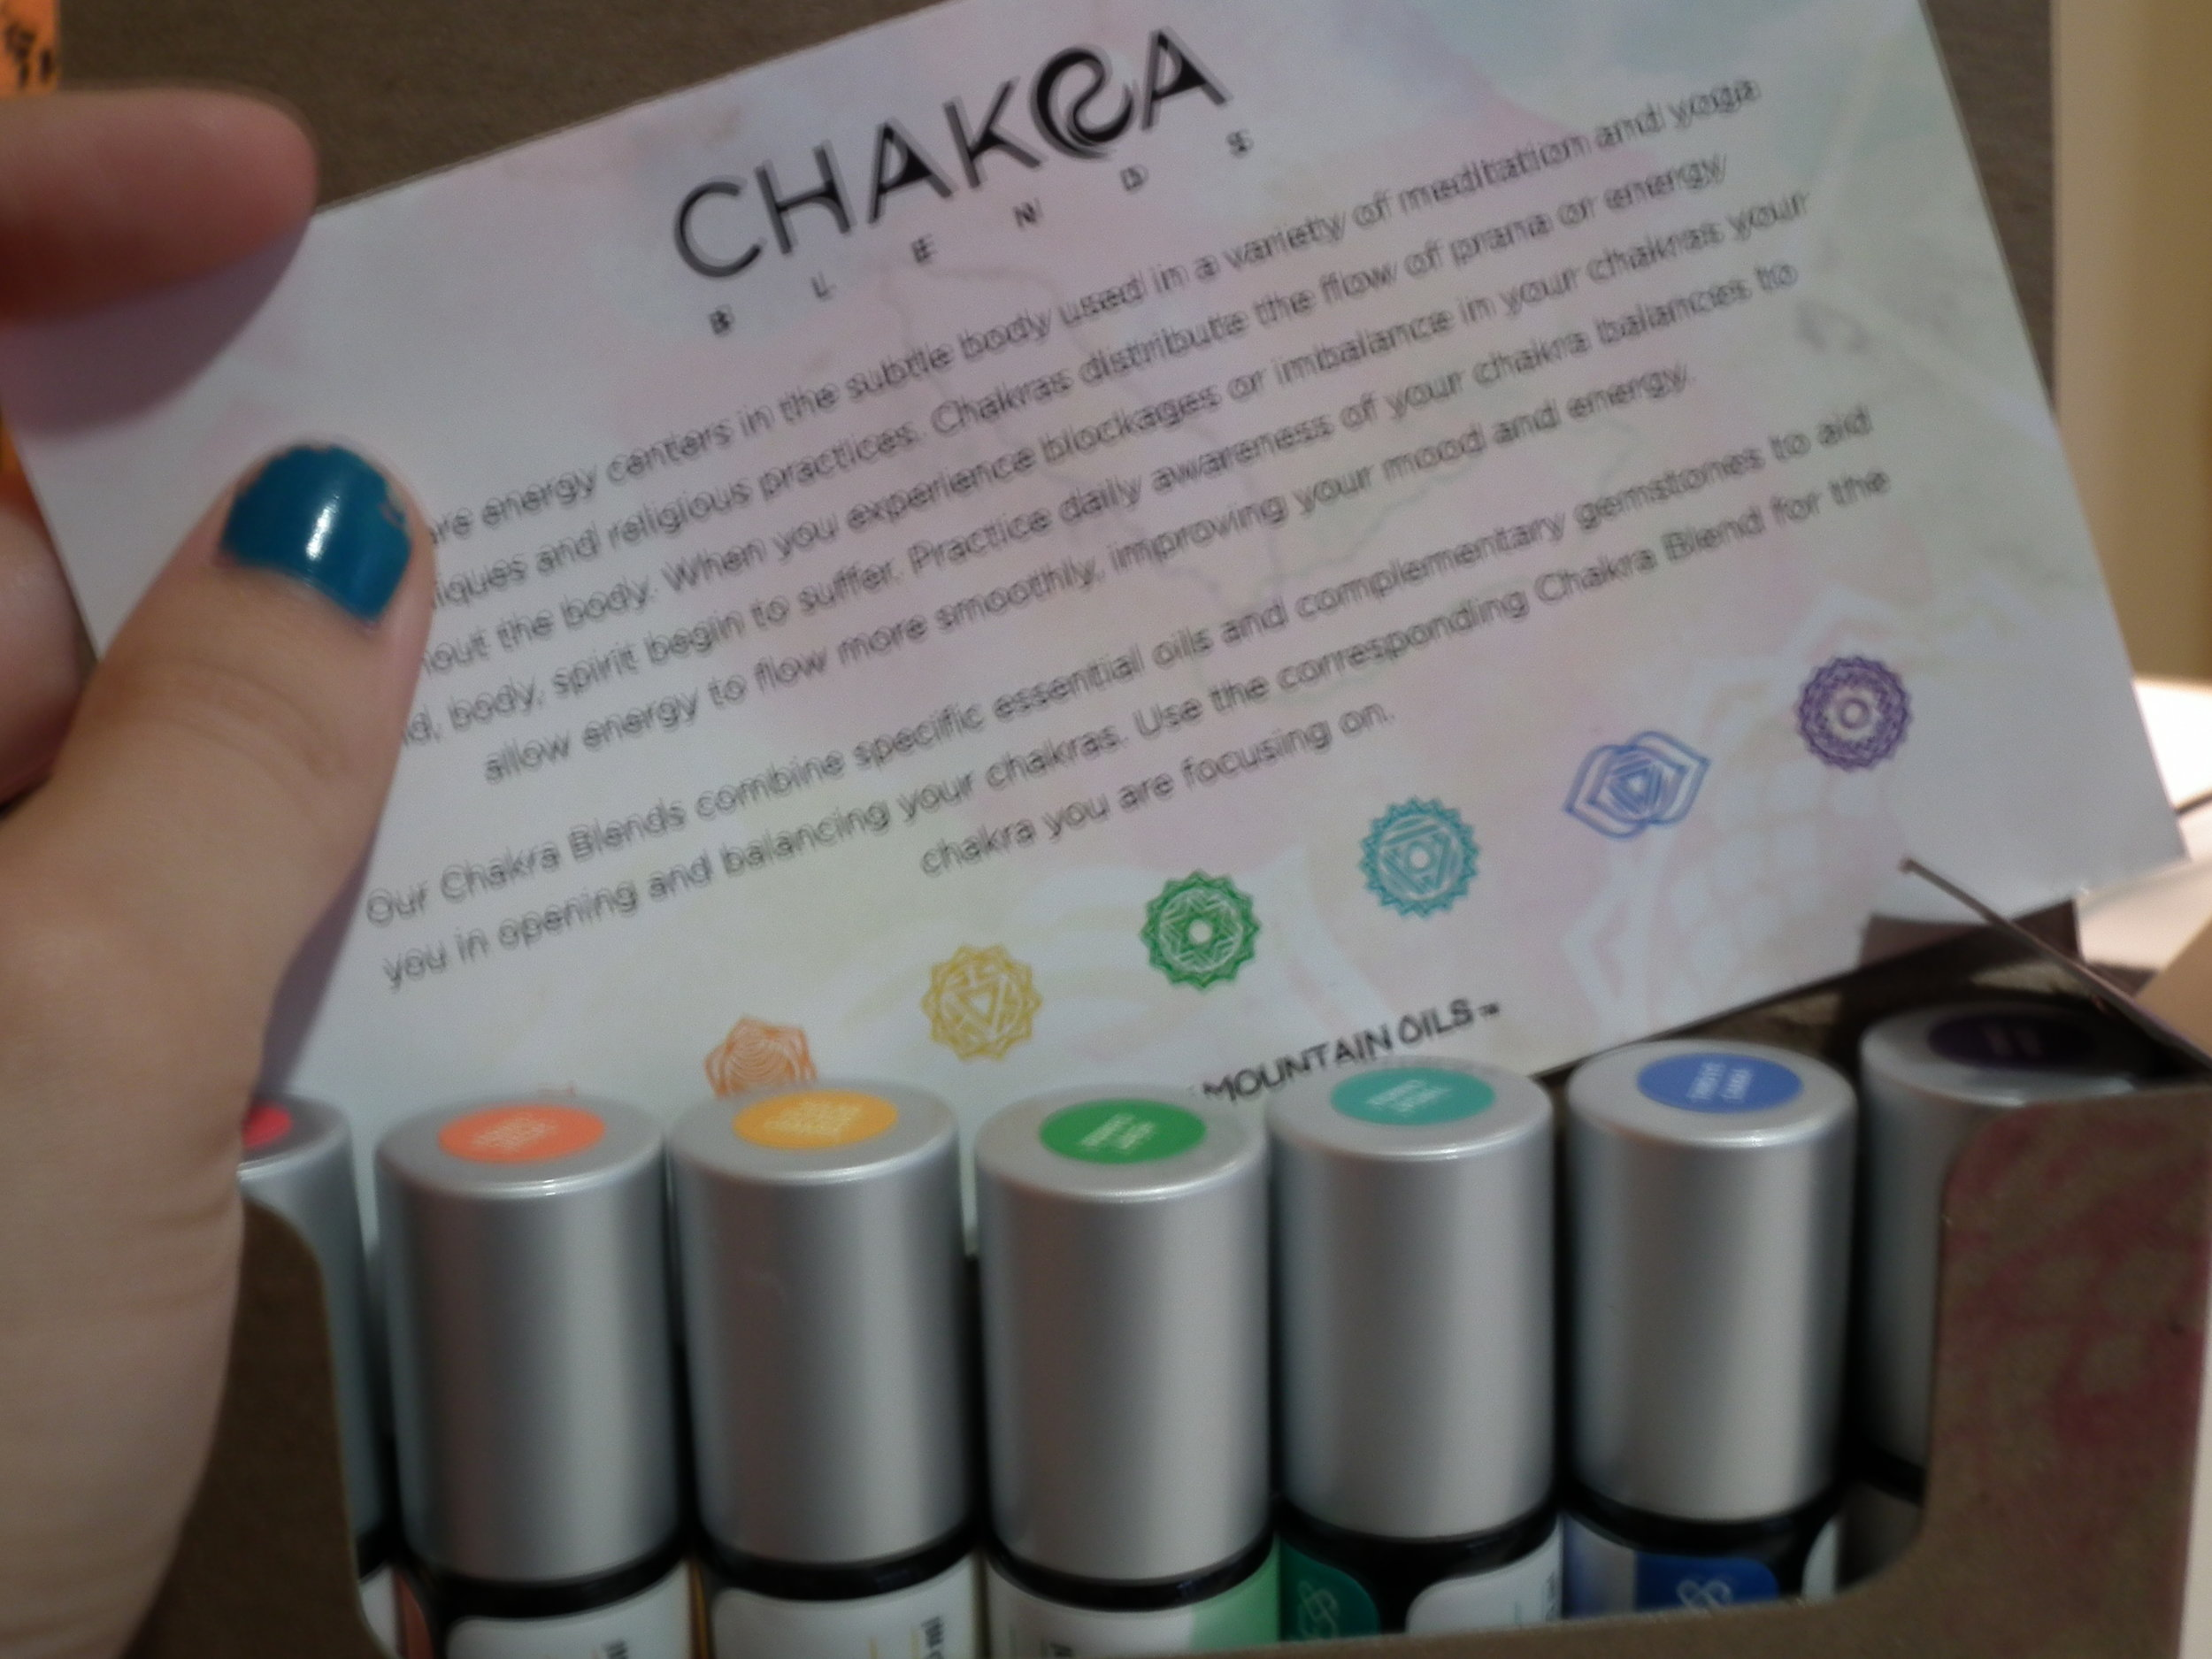 essential-oils-chakras-root-sacral-solar-plexus-hear-throat-third-eye-crown-energy-rocky-mountain-oils